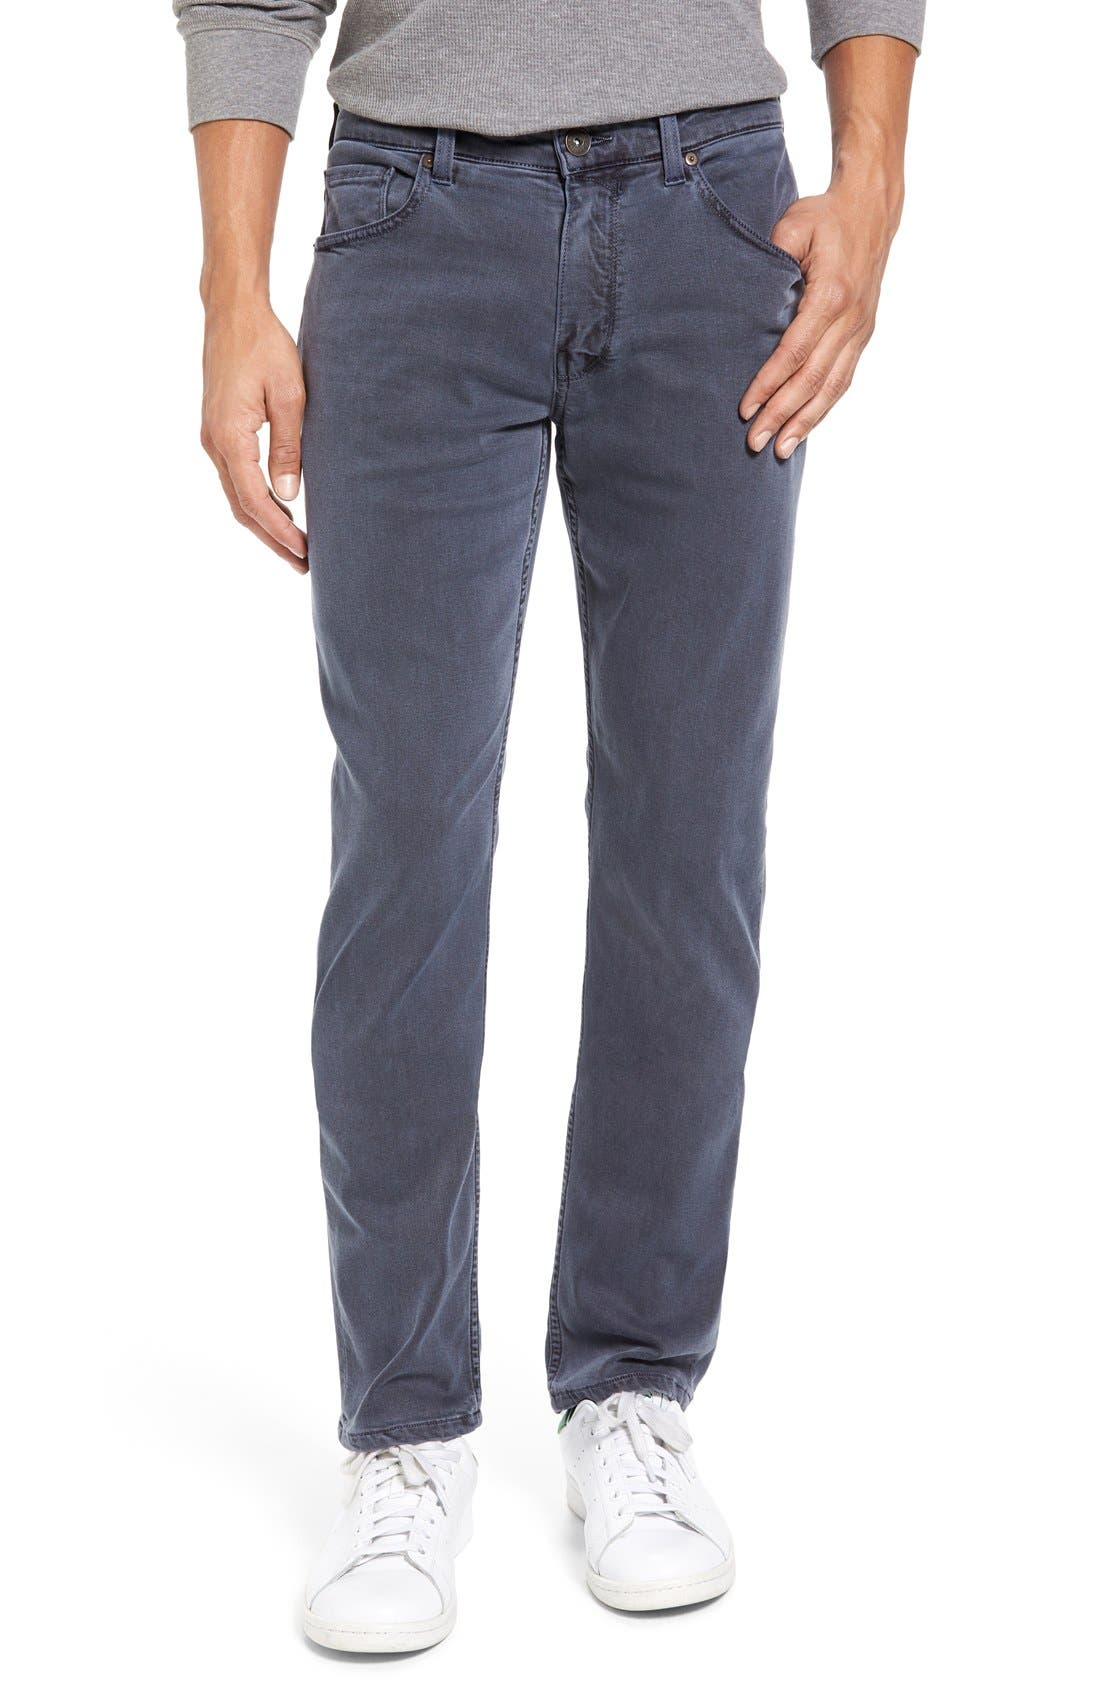 Transcend - Federal Slim Straight Leg Jeans,                             Alternate thumbnail 6, color,                             VINTAGE NAVY